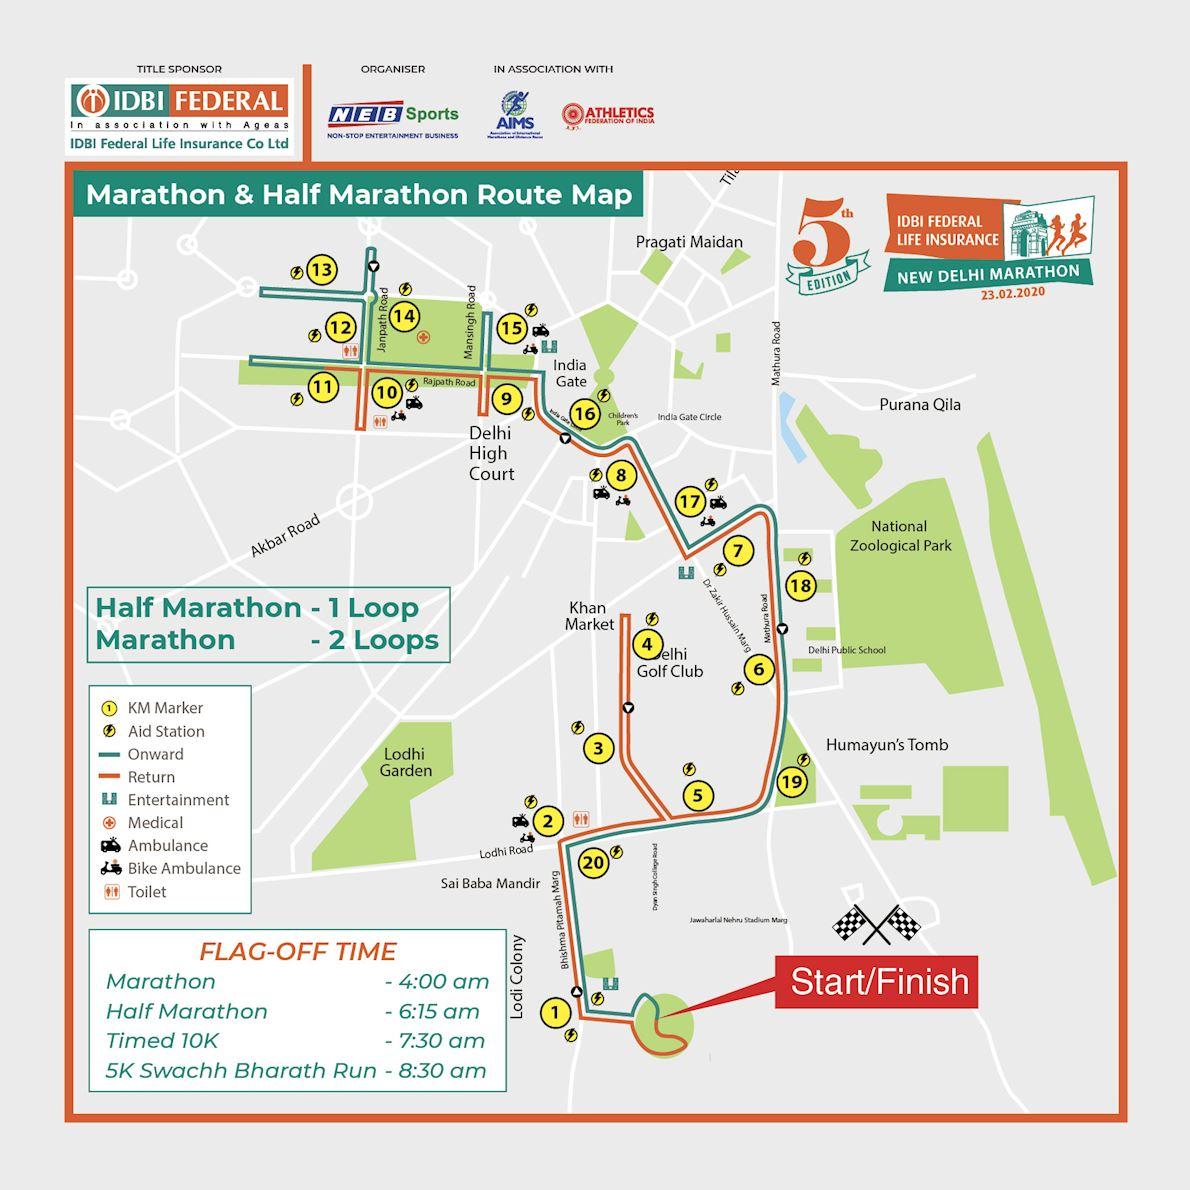 IDBI Federal Life Insurance New Delhi Marathon Route Map